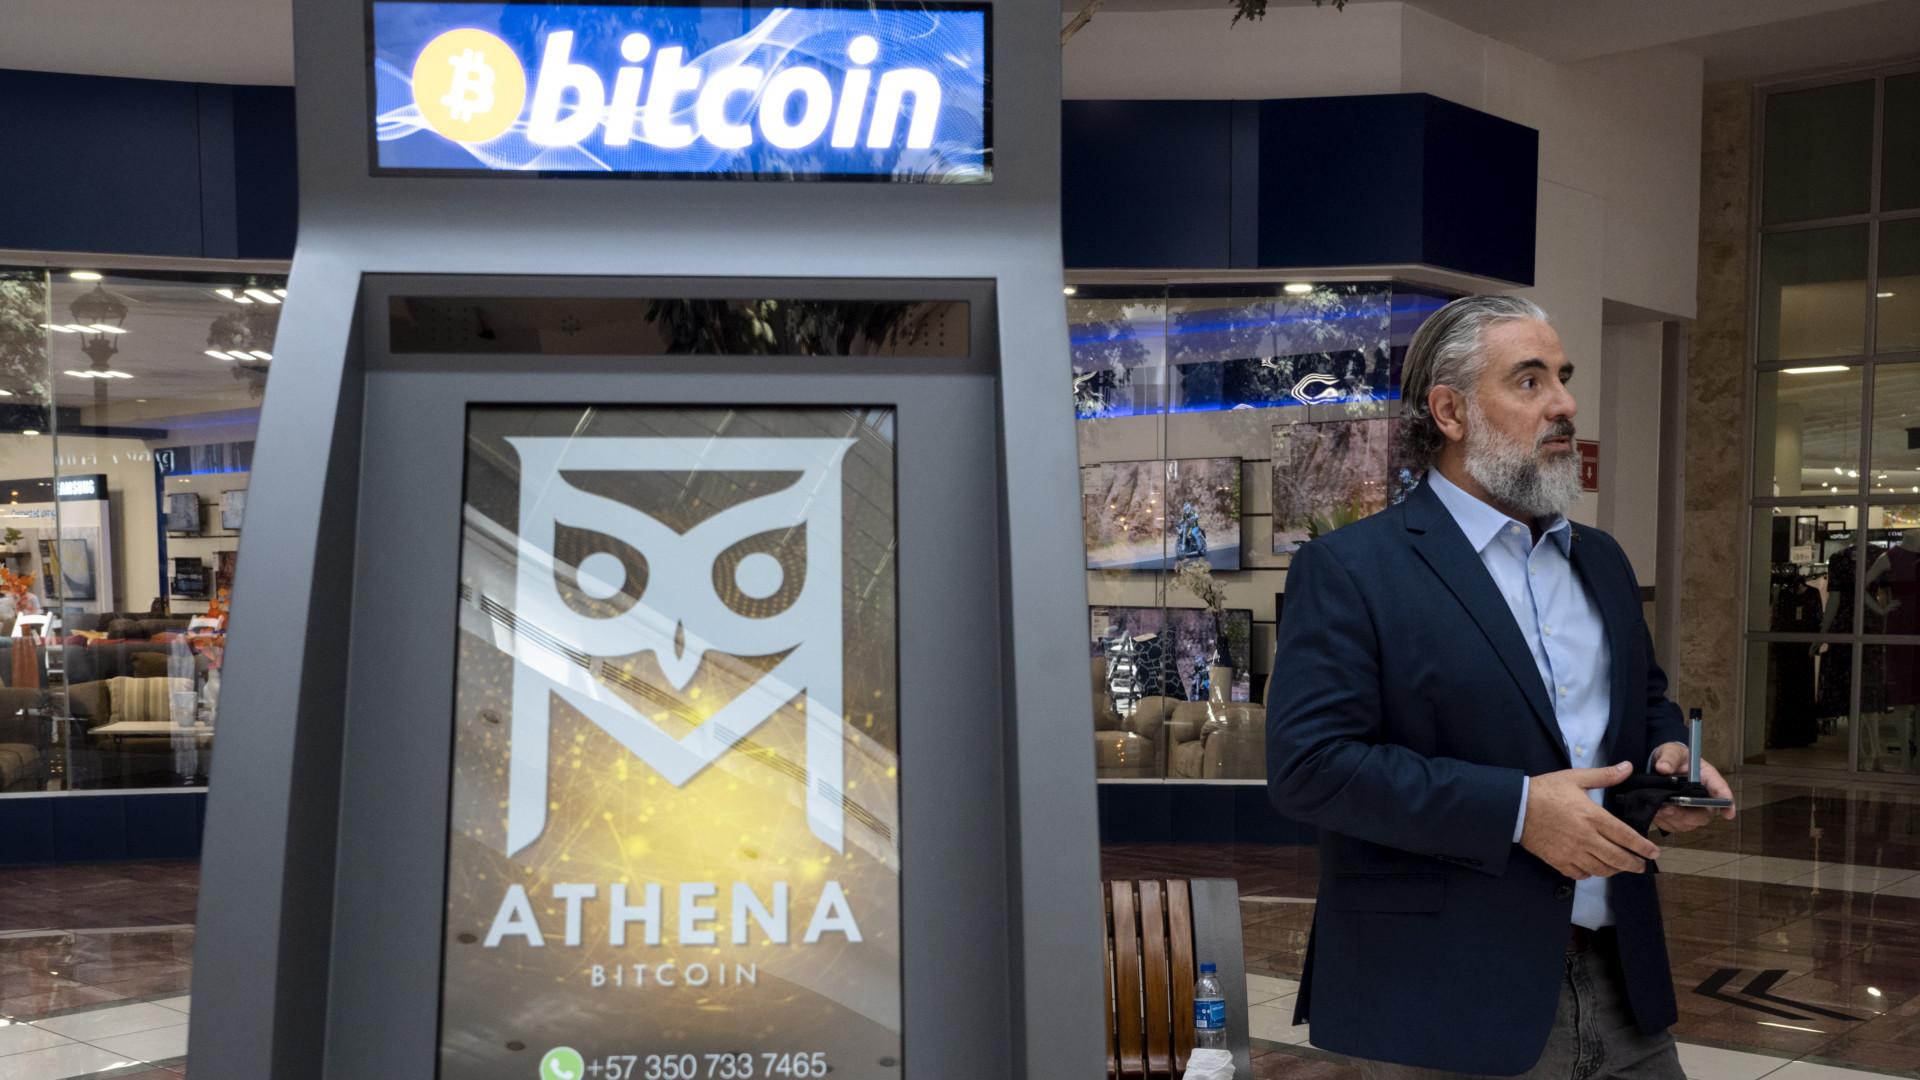 ano ano ang bitcoin bitcoin telugu